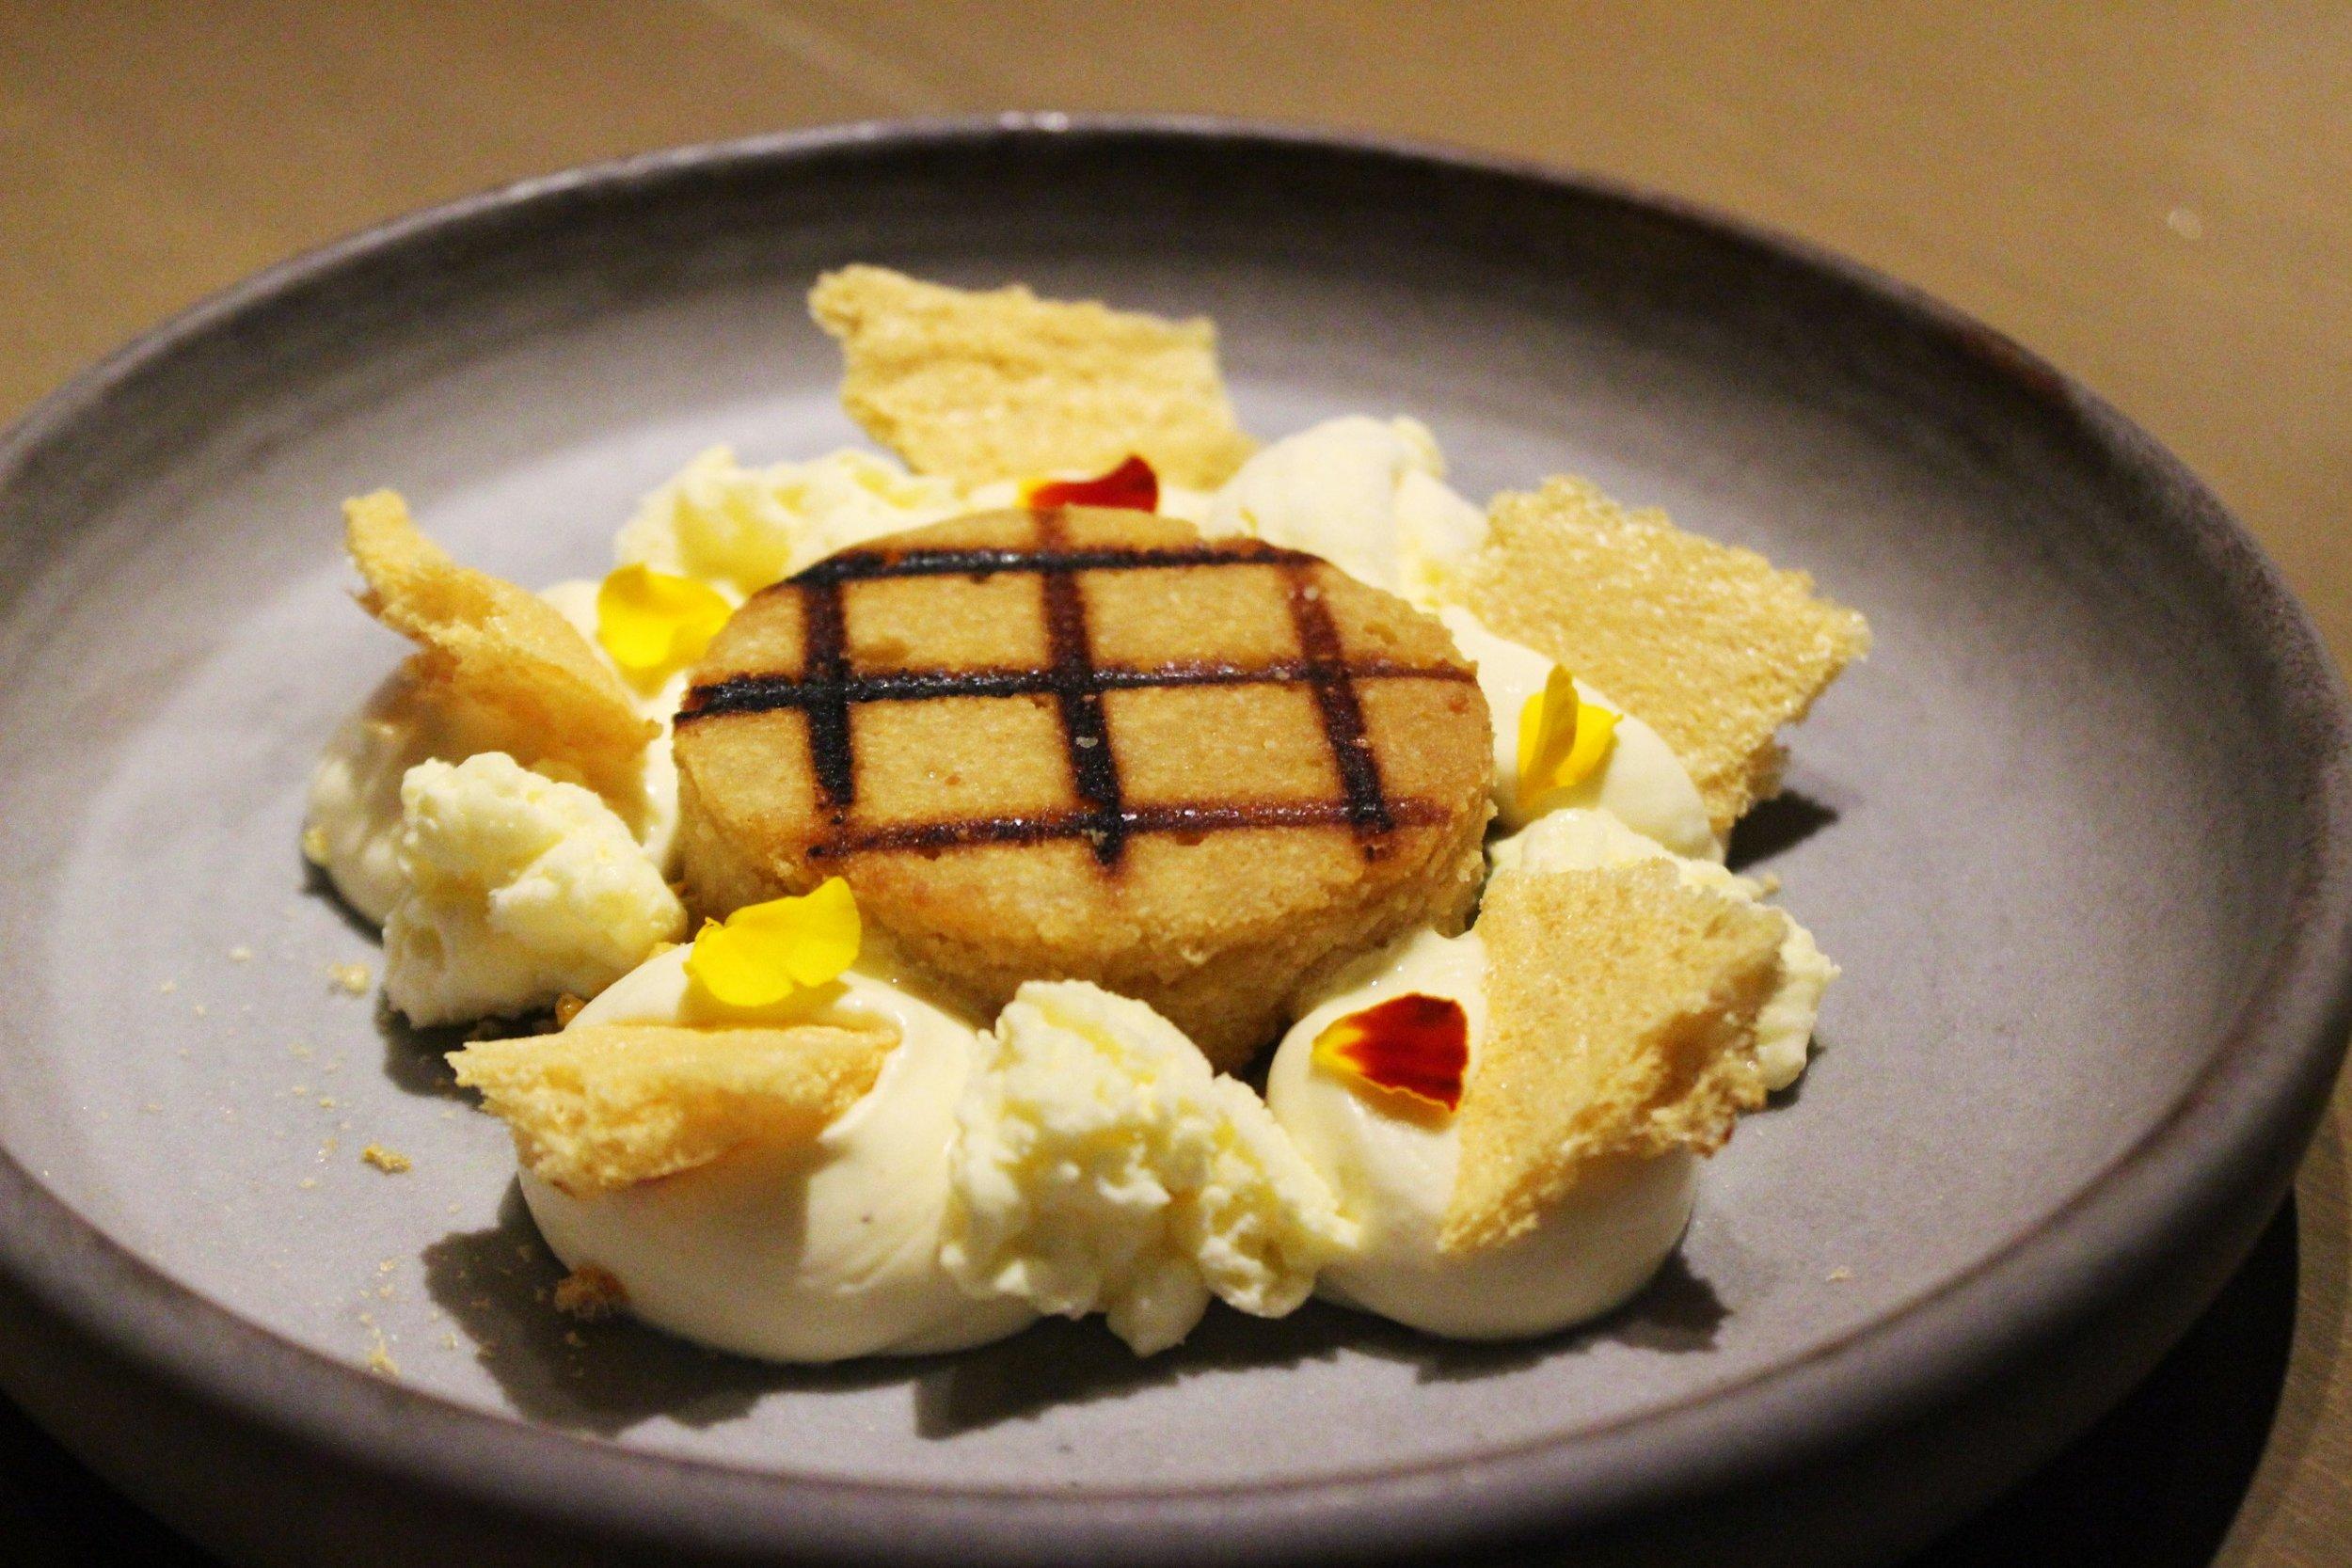 Passion Fruit, Grilled Financier, Jasmine Mascarpone, Honeycomb